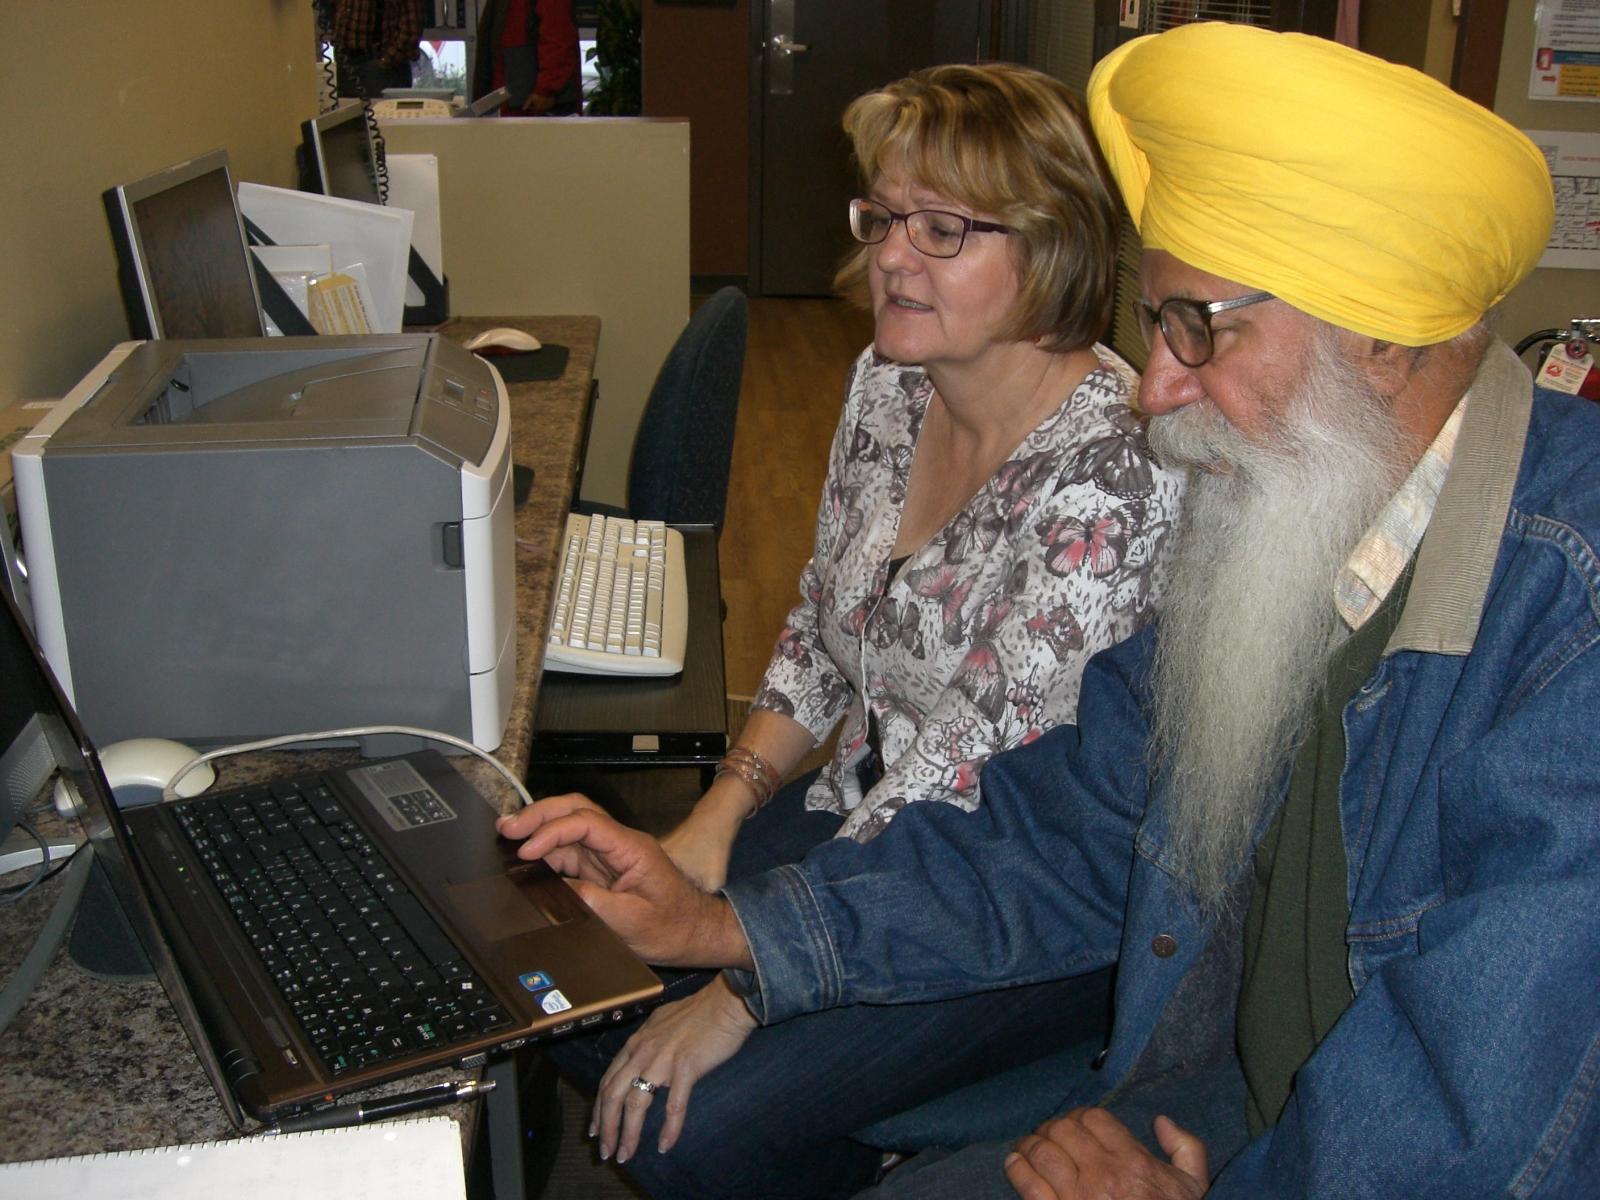 Mentoring computer skills